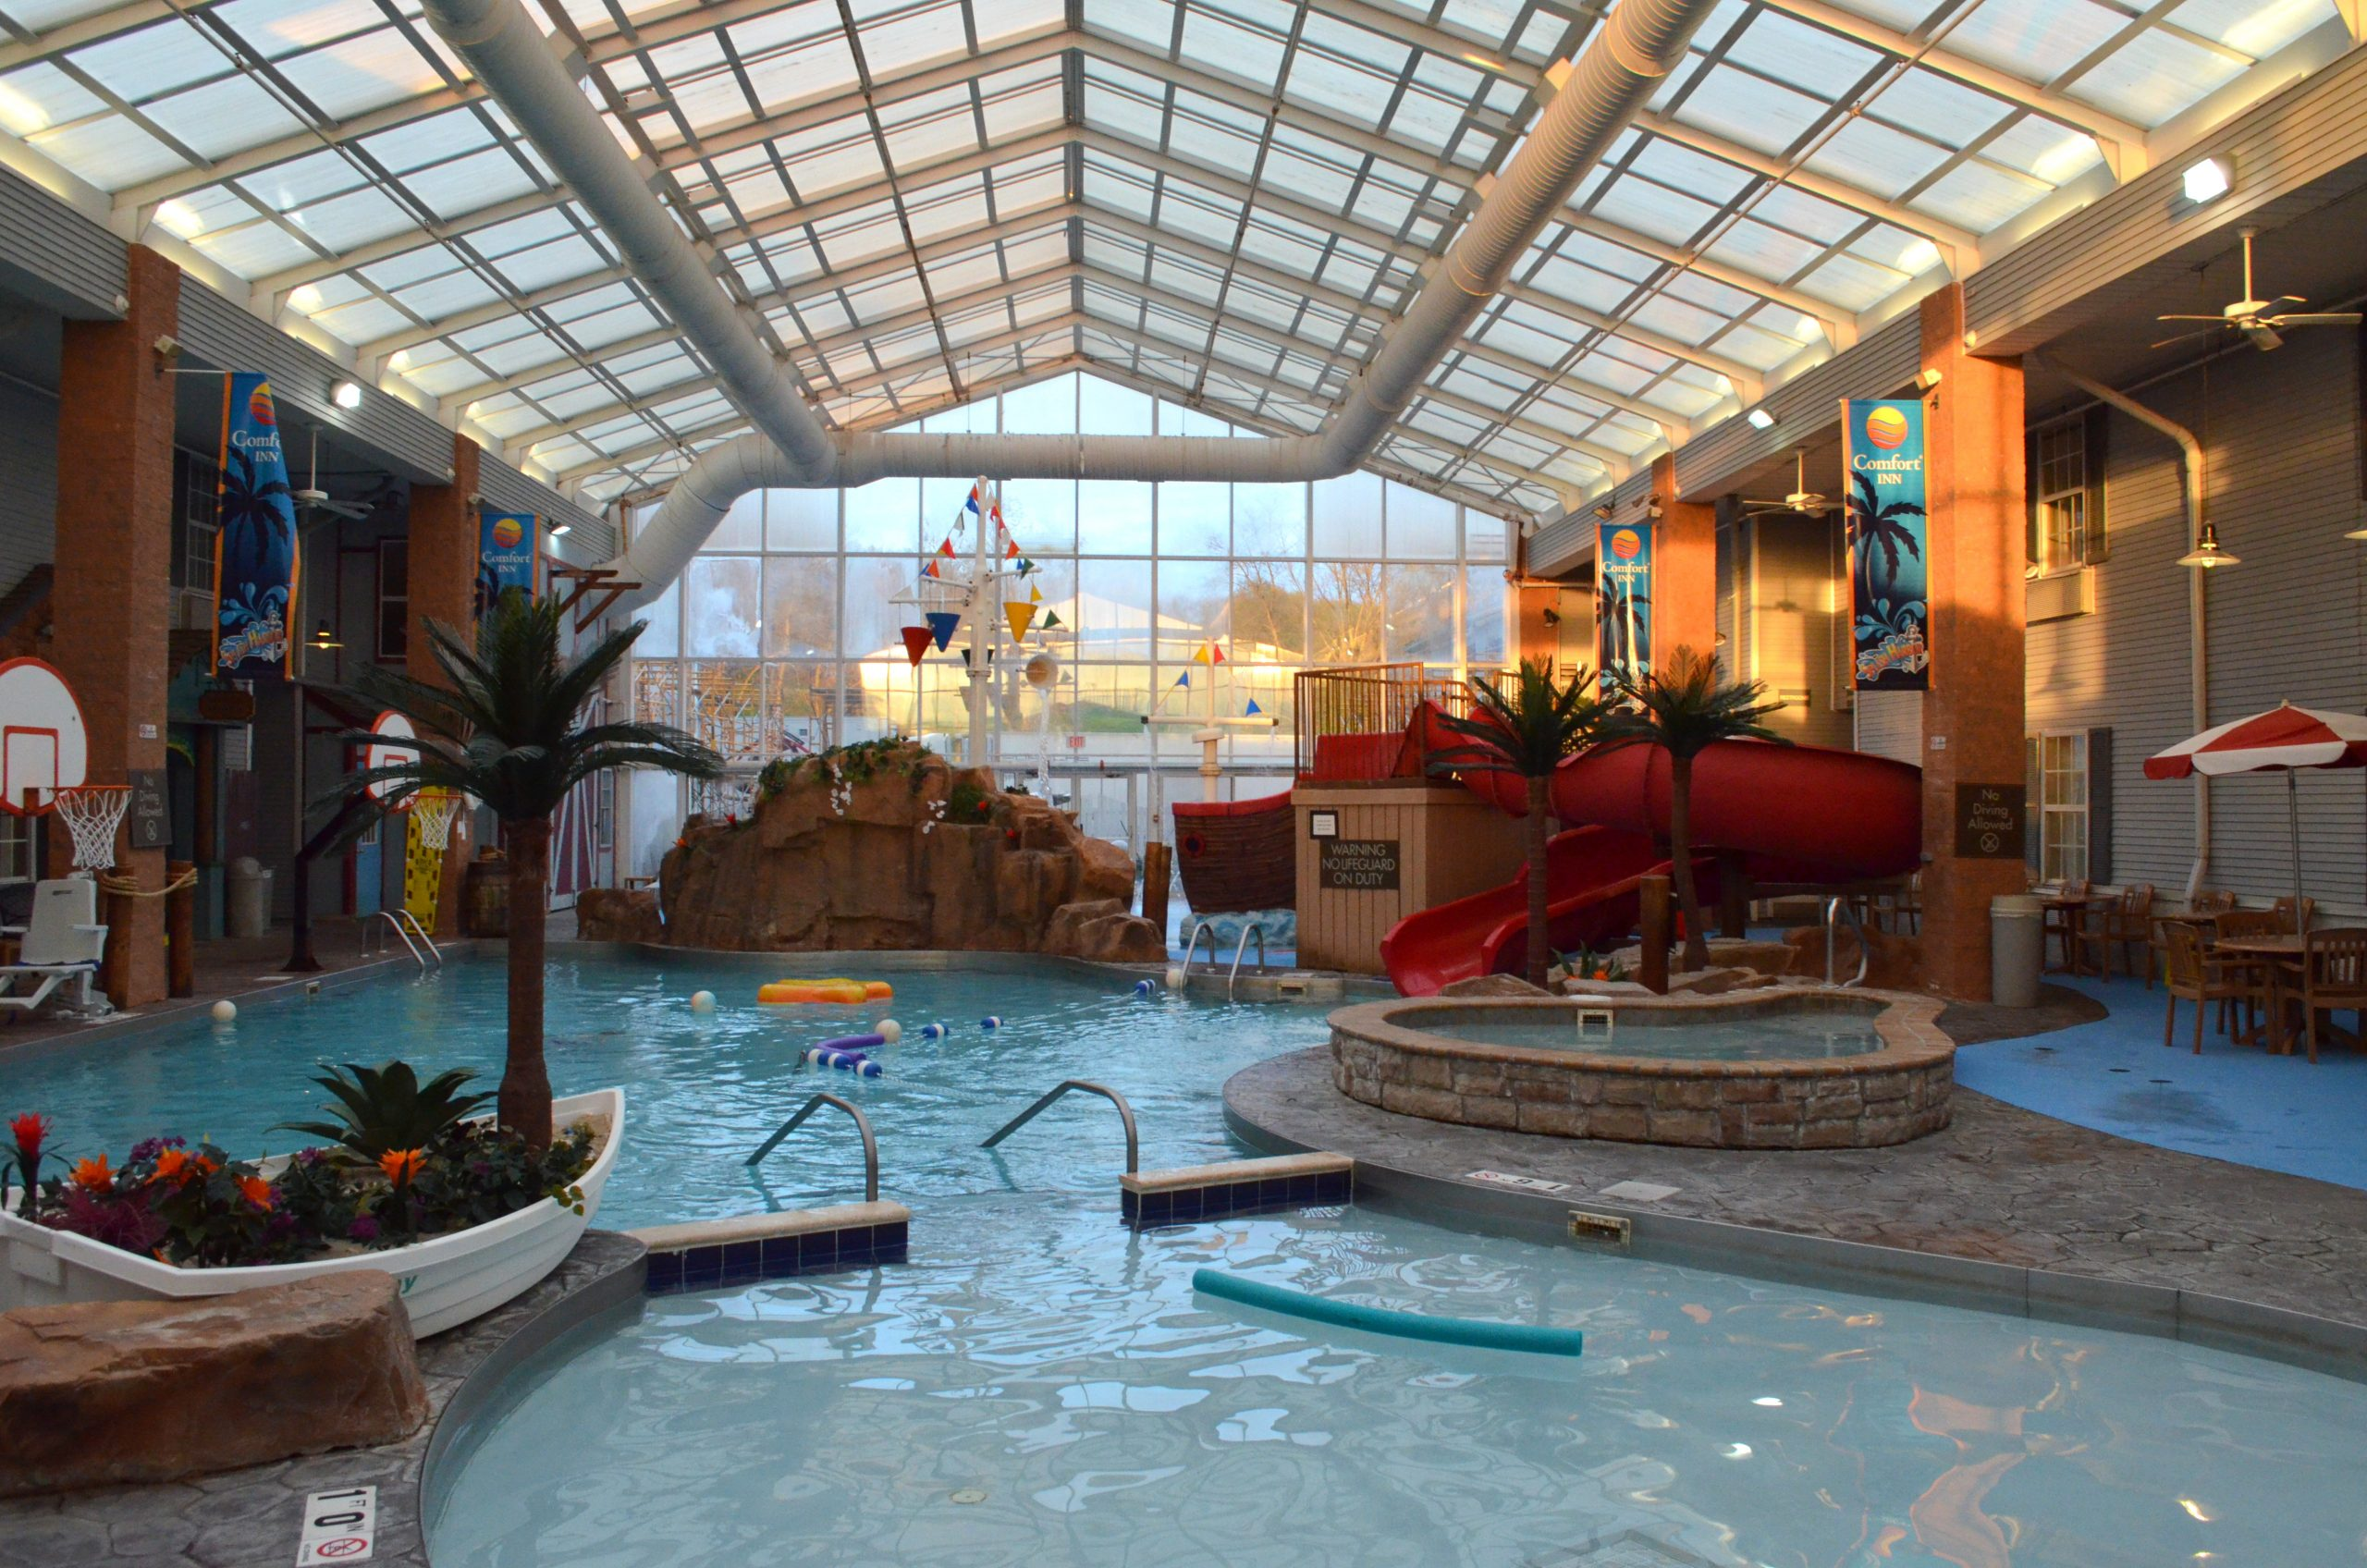 Fun Family Getaway Comfort Inn Splash Harbor In Bellville